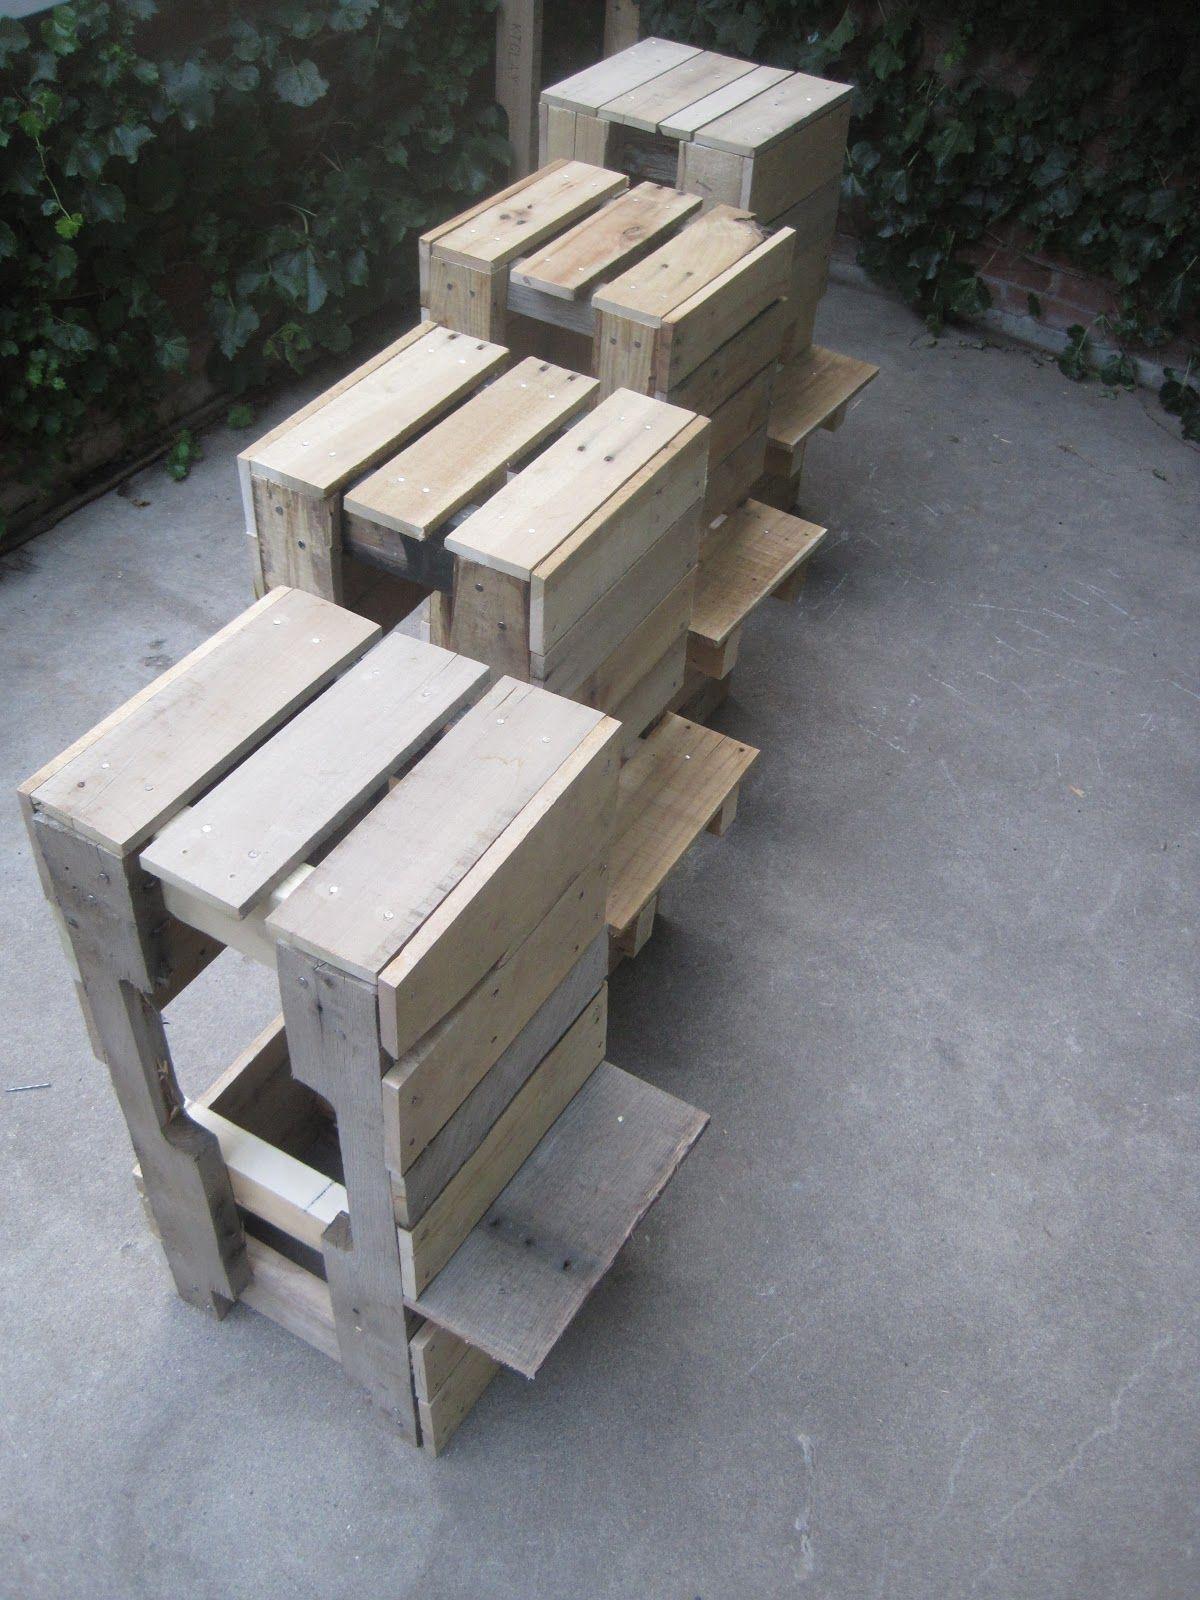 Kreative Palettenmöbel – selbstgebaute Stühle und Sessel